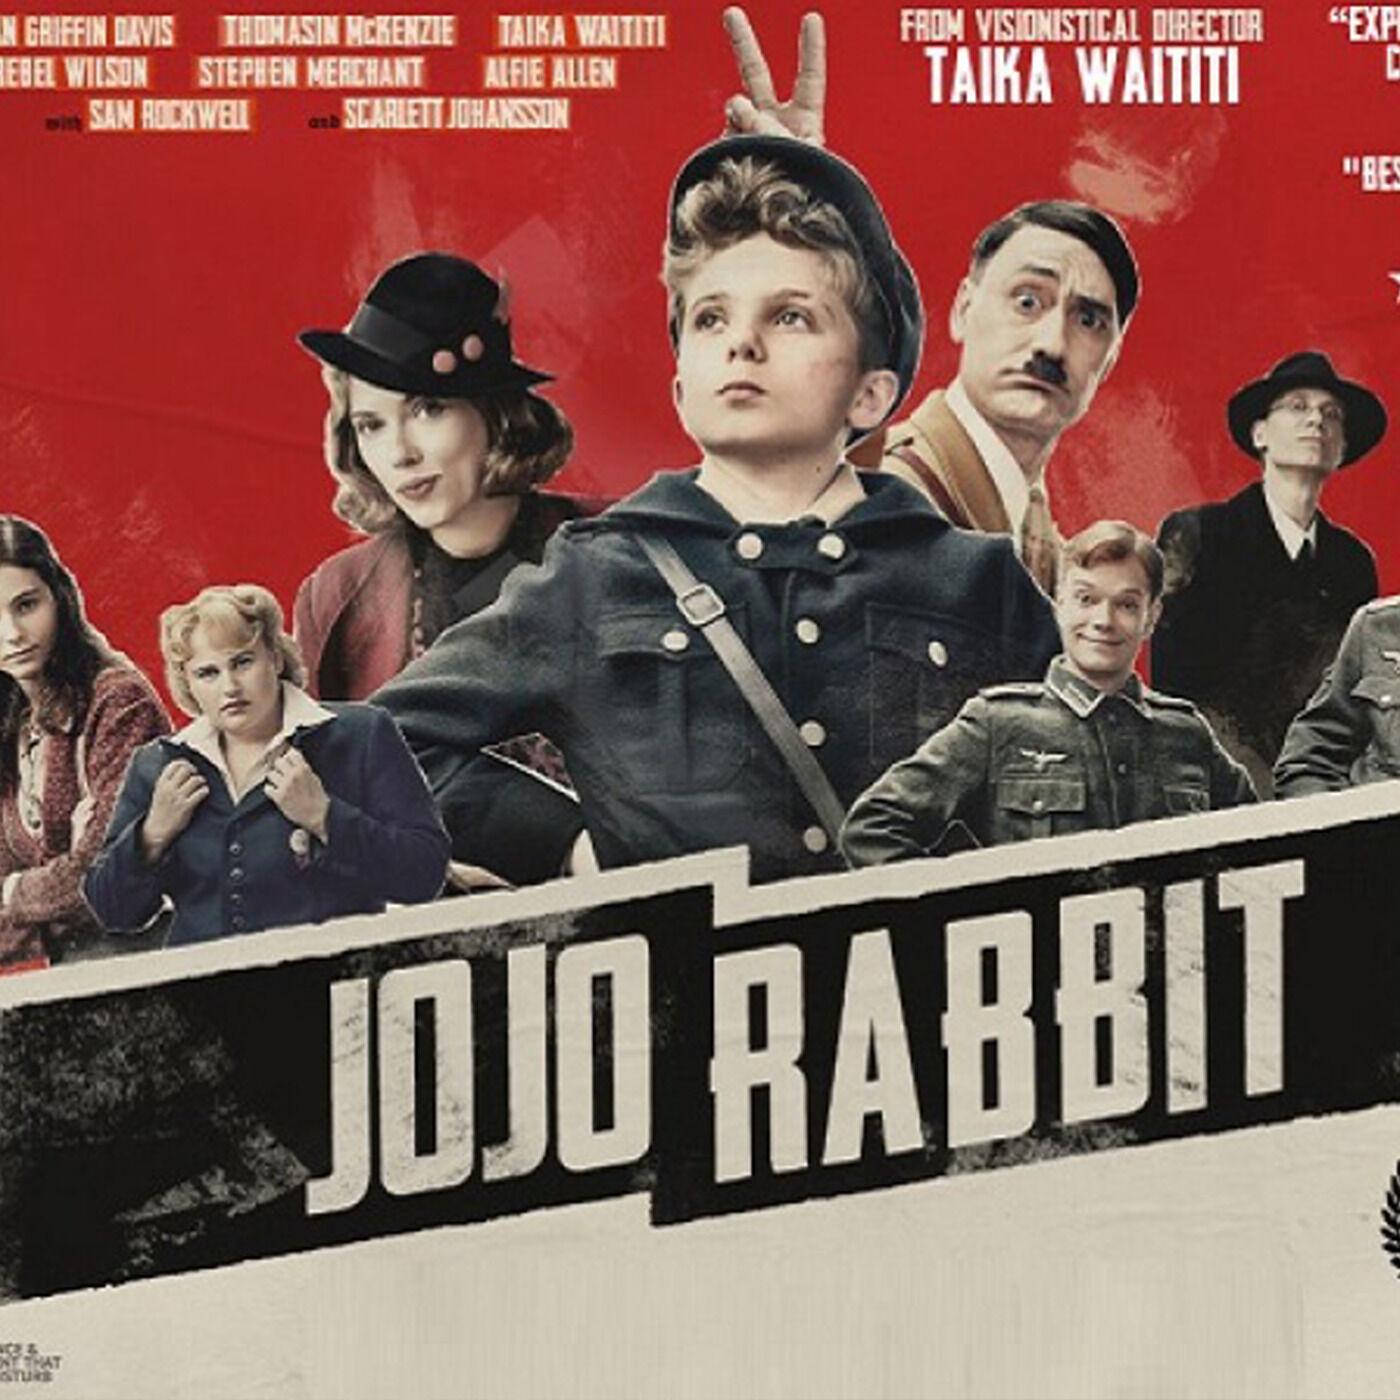 Episode 6: Jojo Rabbit